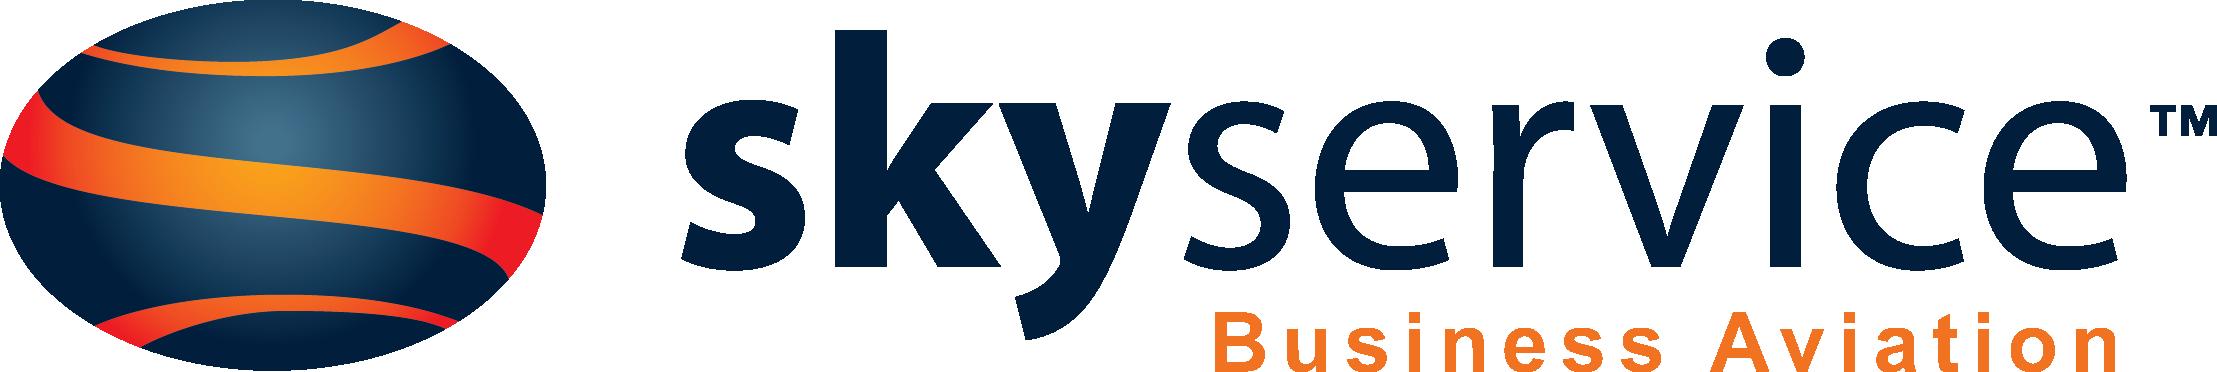 Skyservice